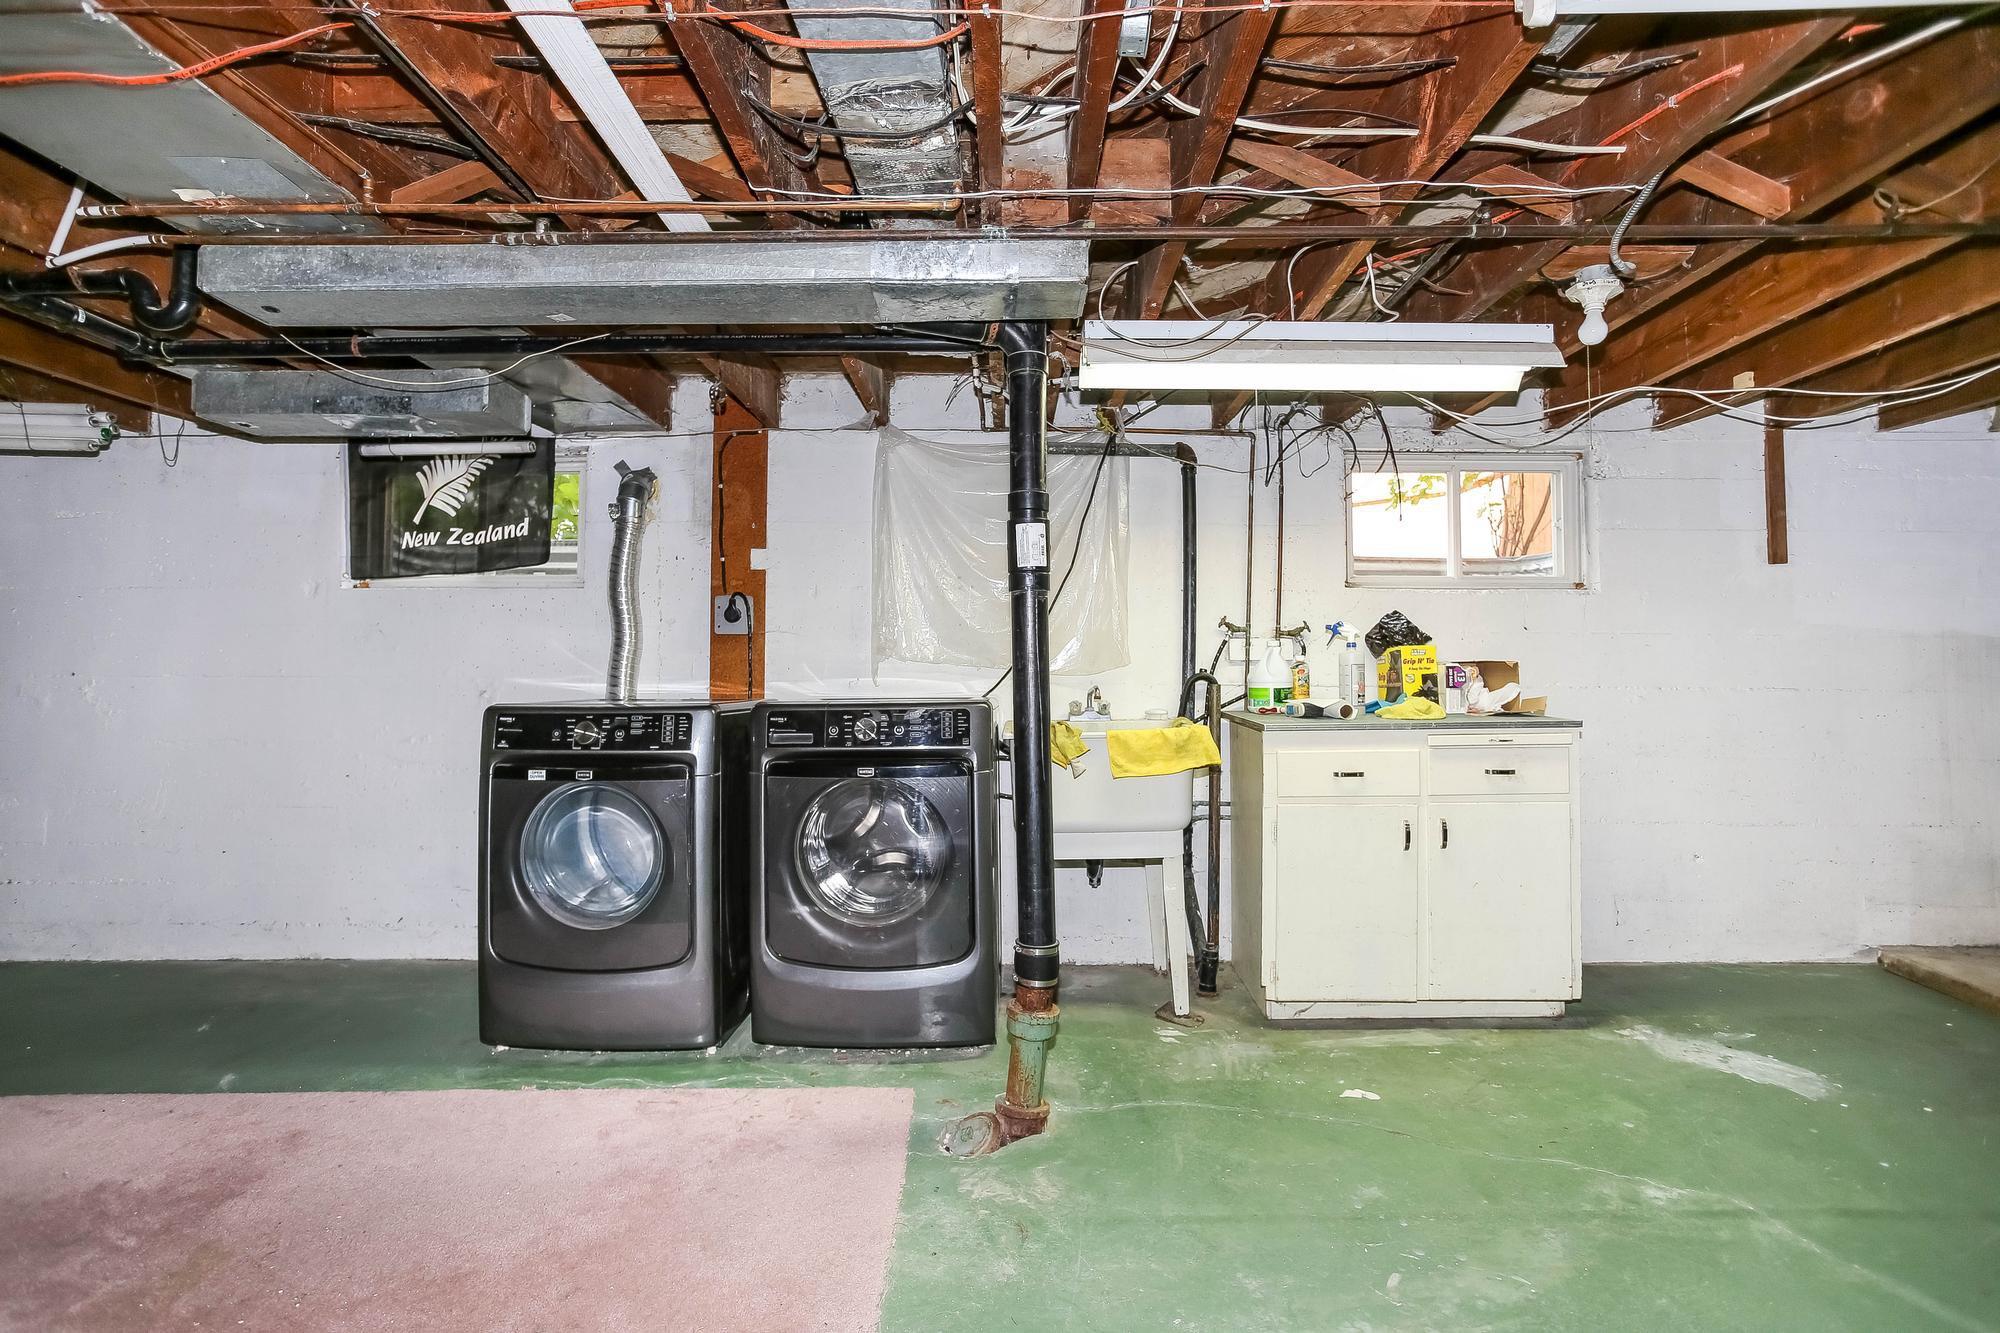 Photo 27: Photos: 155 Borebank Street in Winnipeg: River Heights Single Family Detached for sale (1C)  : MLS®# 202017166